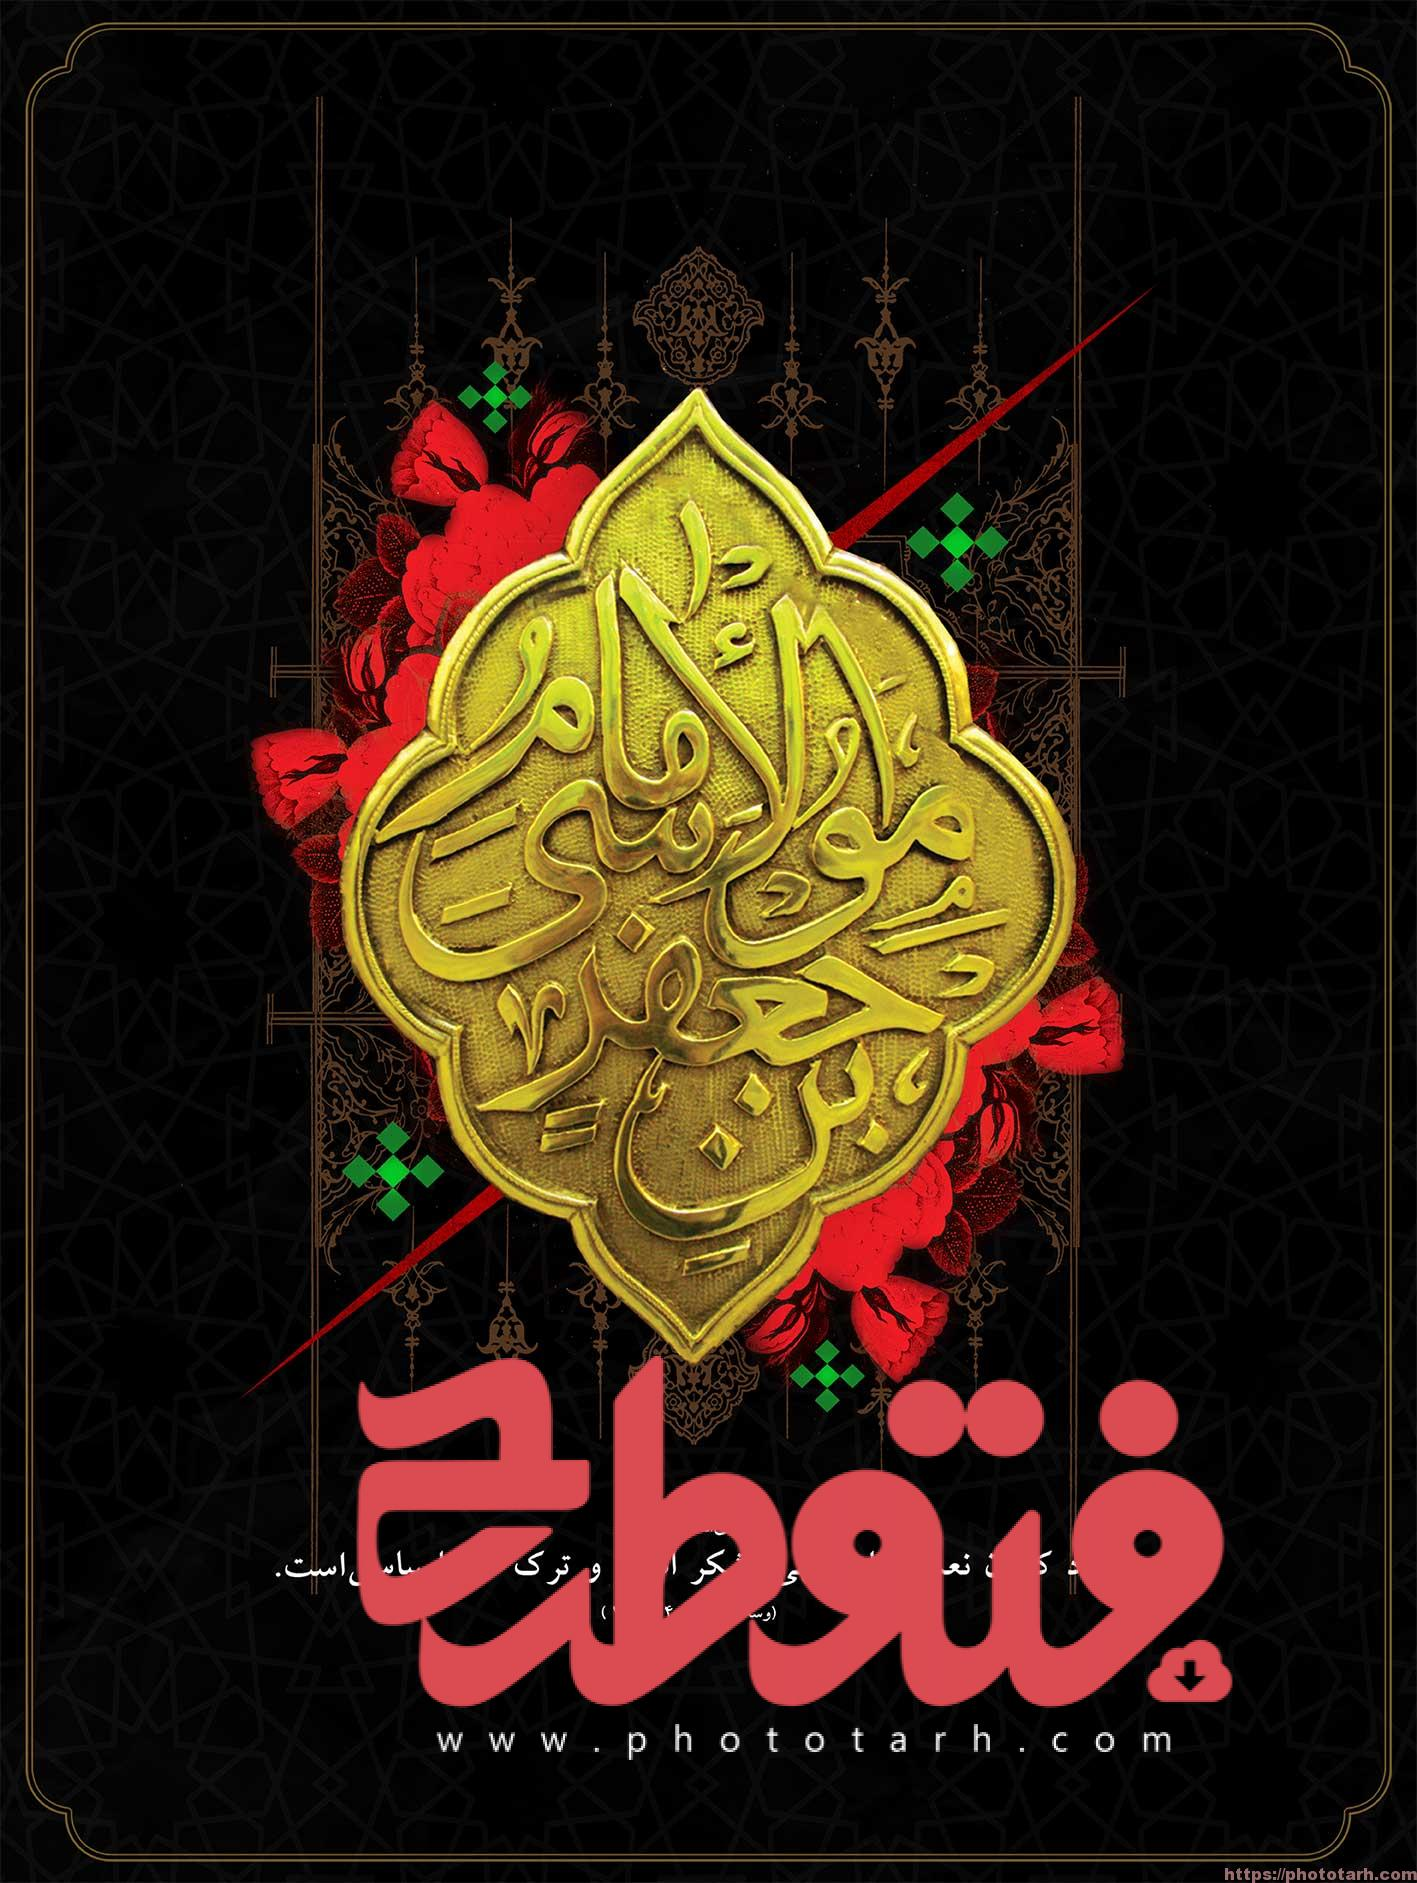 Avek95 - طرح لایه باز شهادت امام موسی کاظم